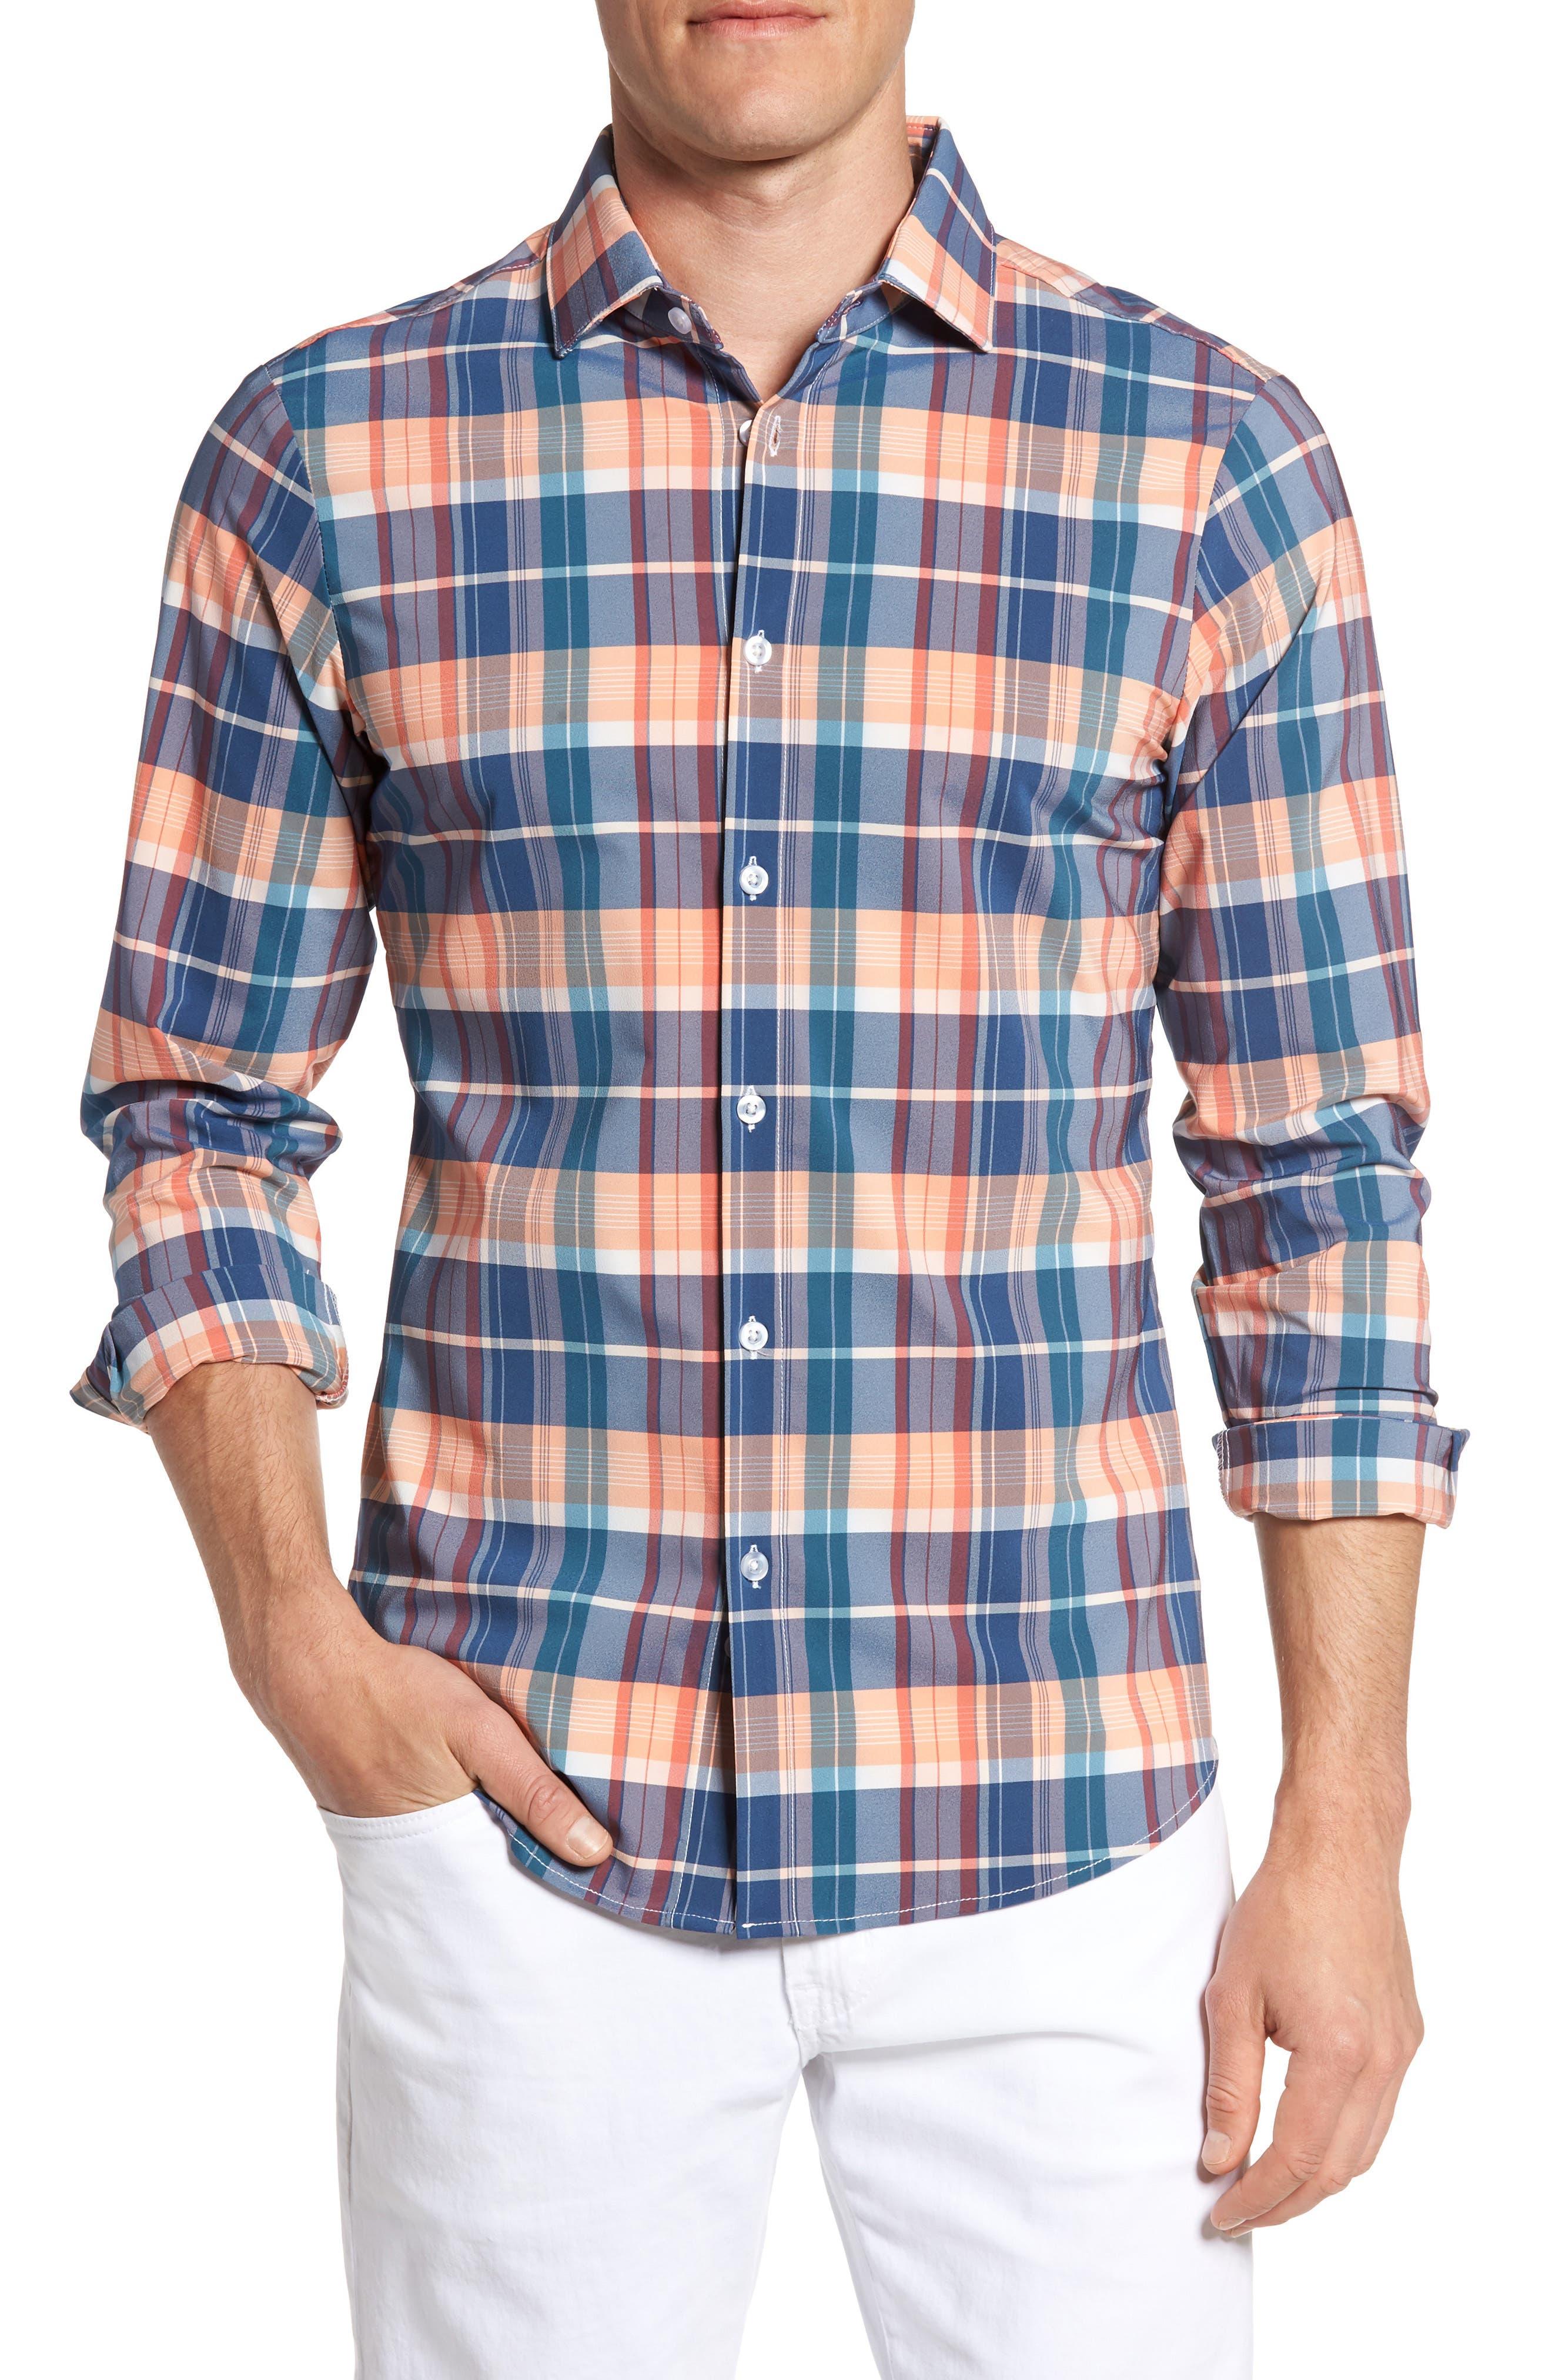 Alternate Image 1 Selected - Mizzen+Main Potomac Madras Performance Sport Shirt (Regular & Tall)